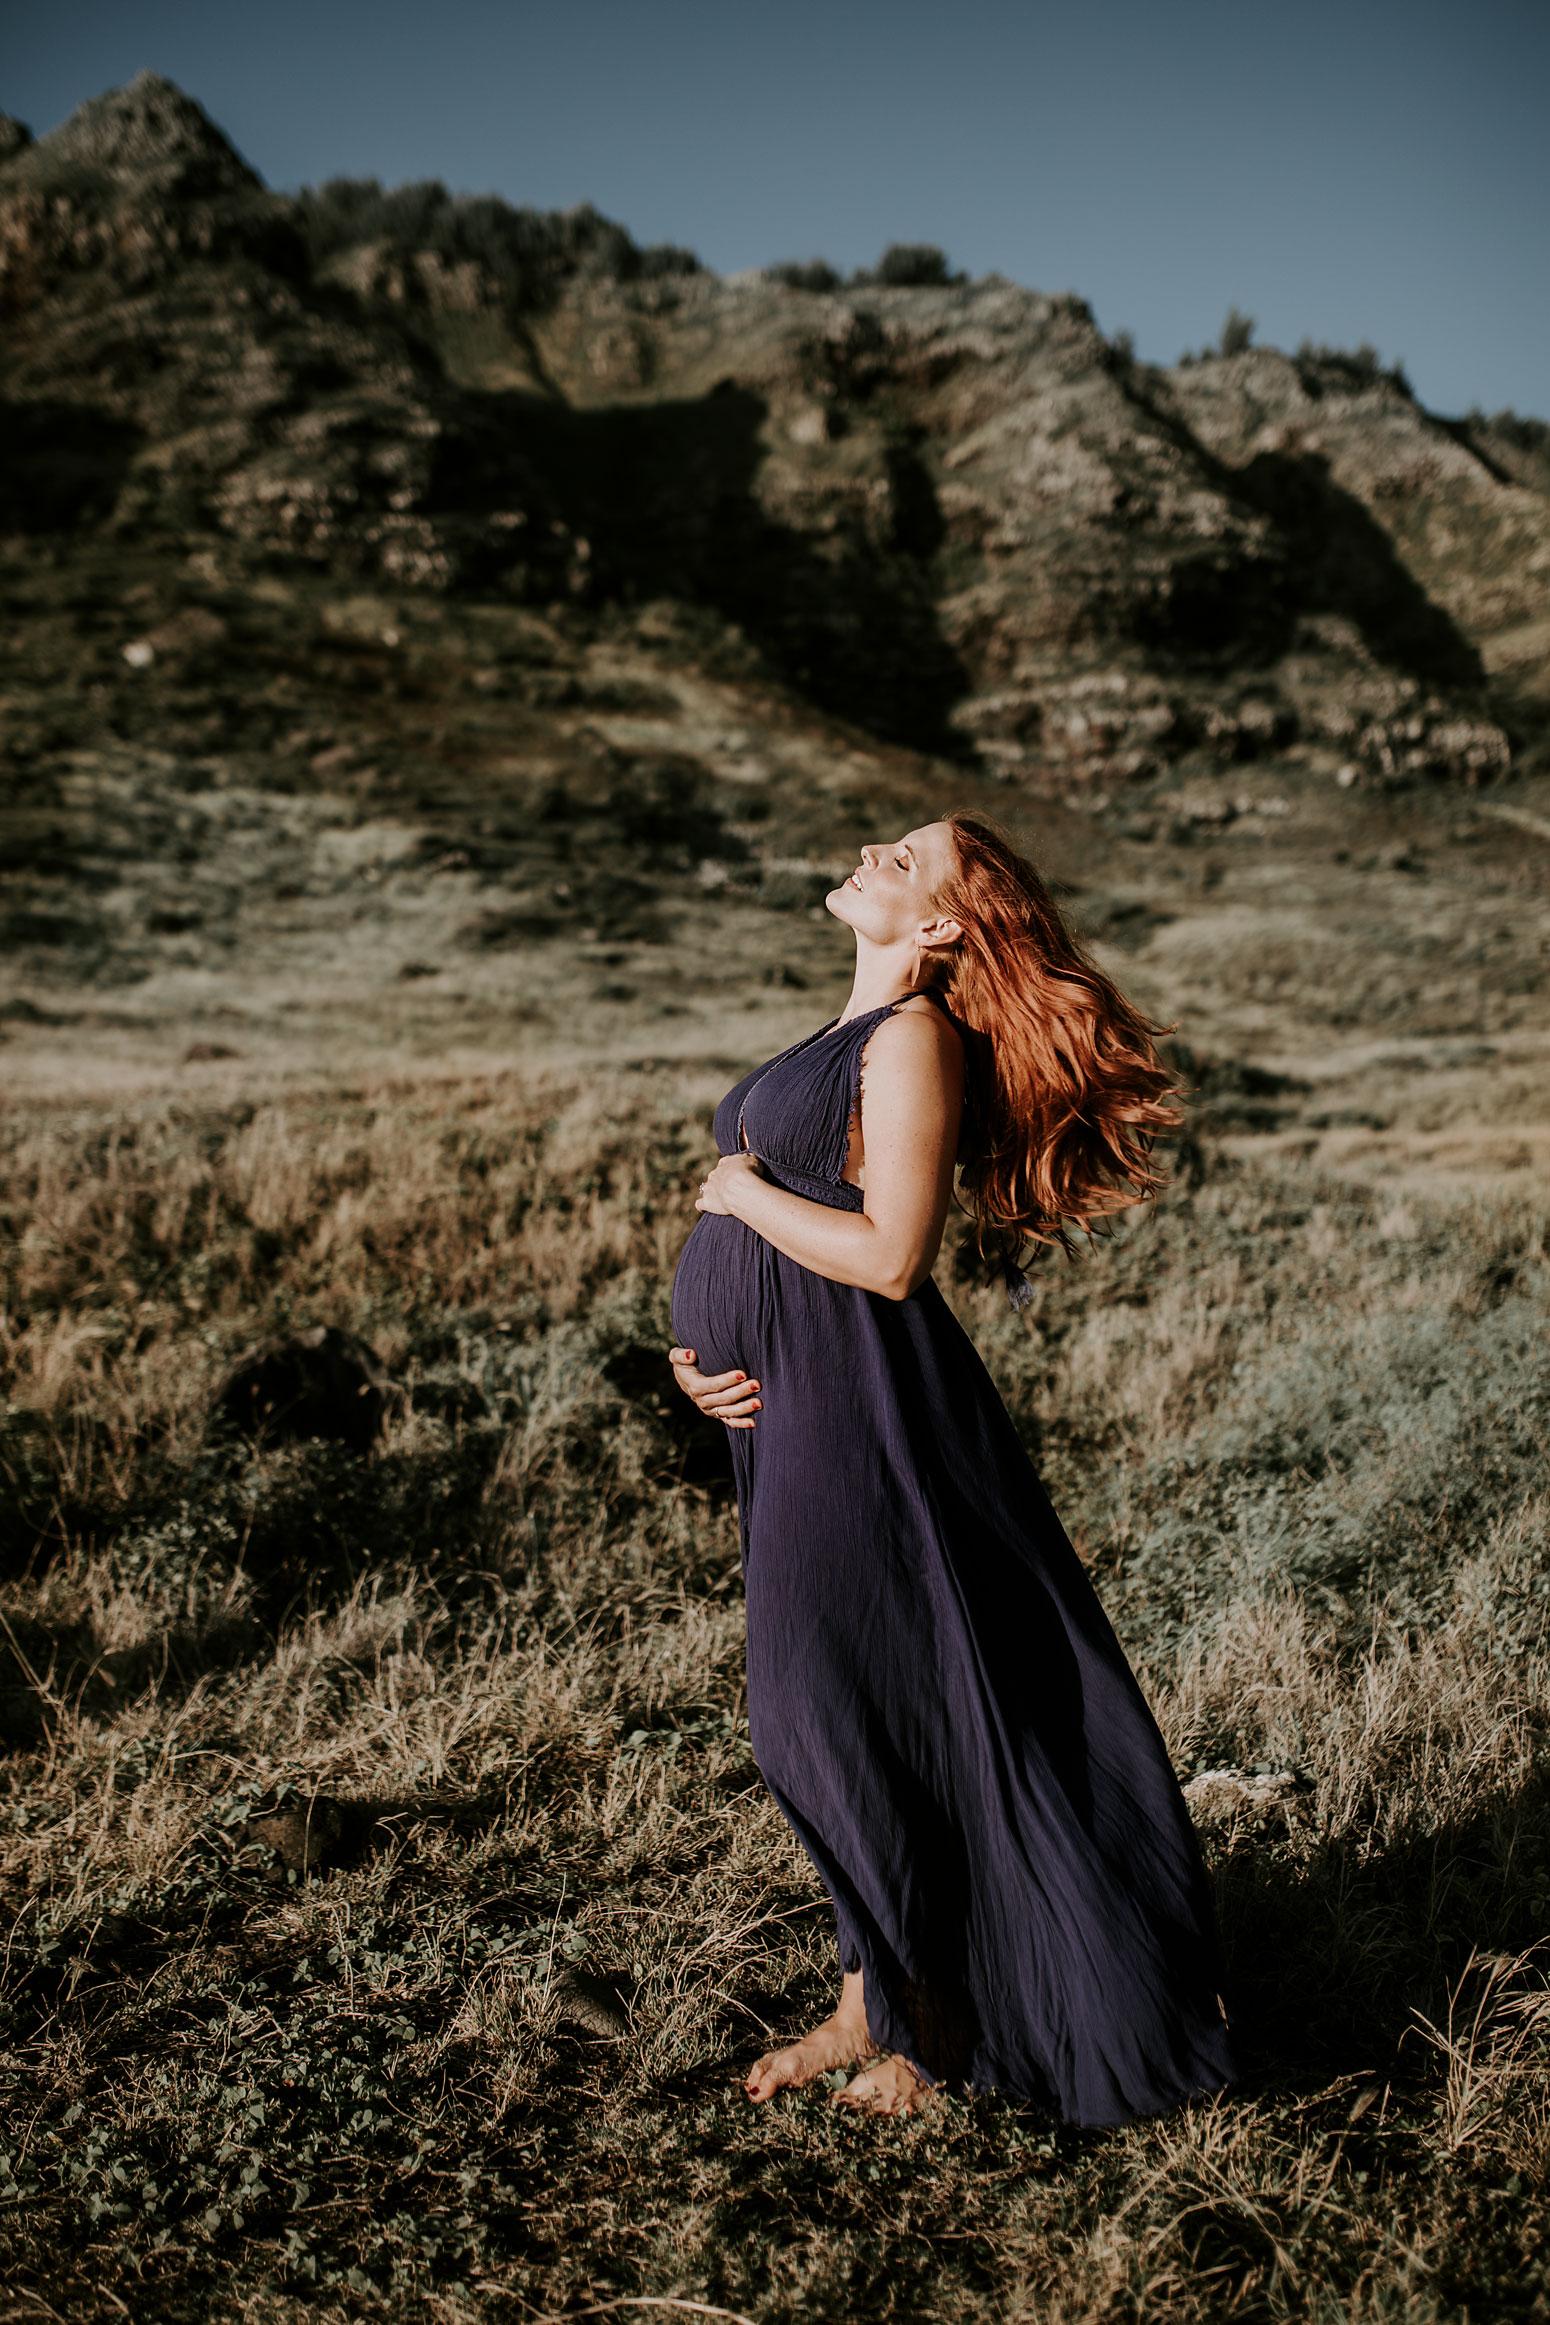 oahu-maternity-photographer-the-sophia-co03.jpg